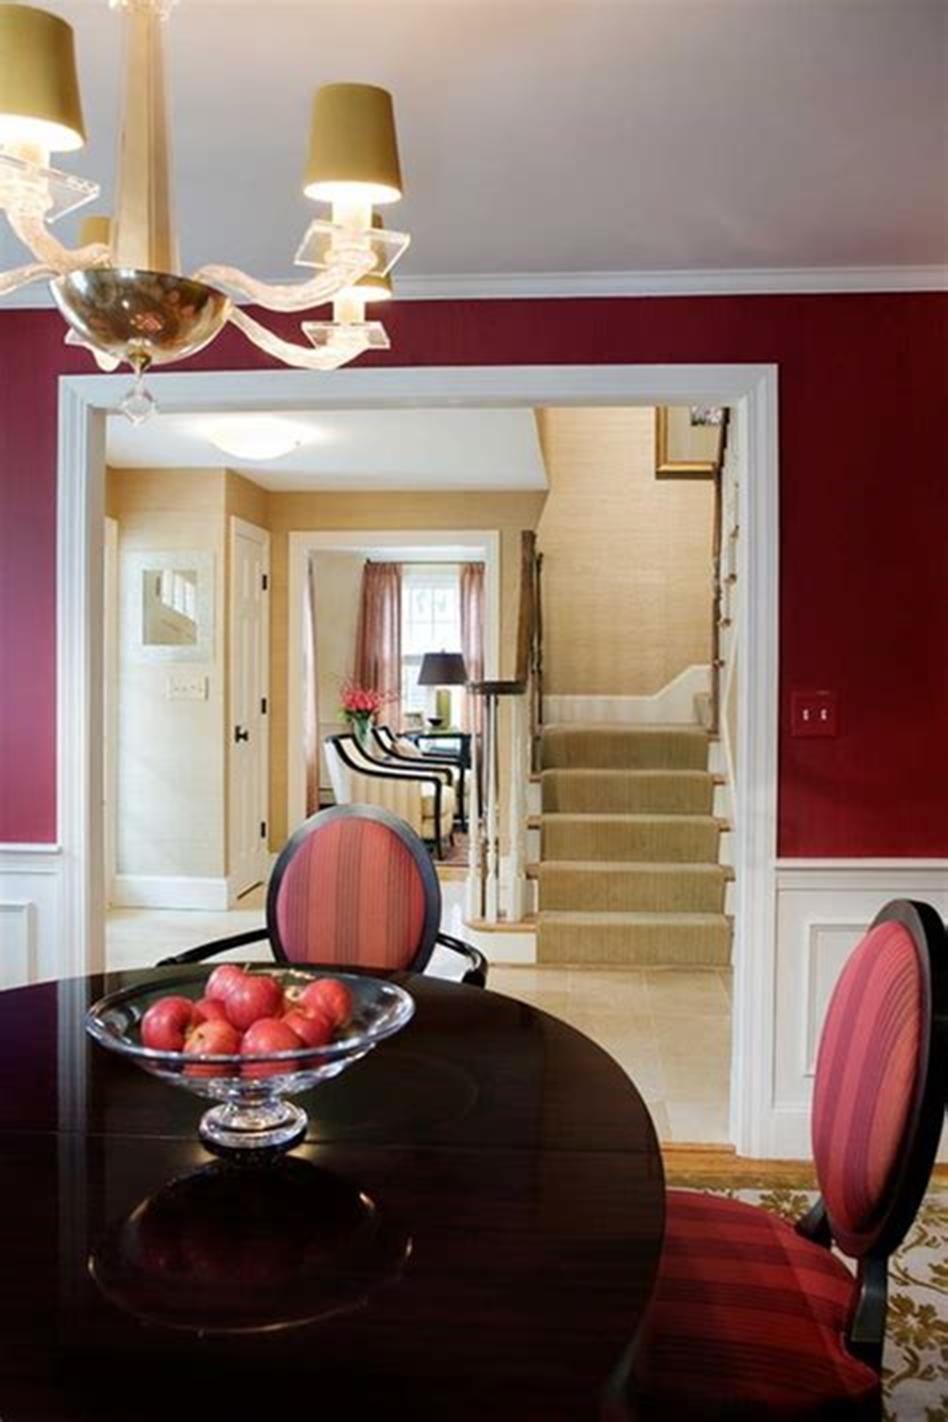 43 most popular dining room design and decorating ideas perfect rh pinterest com